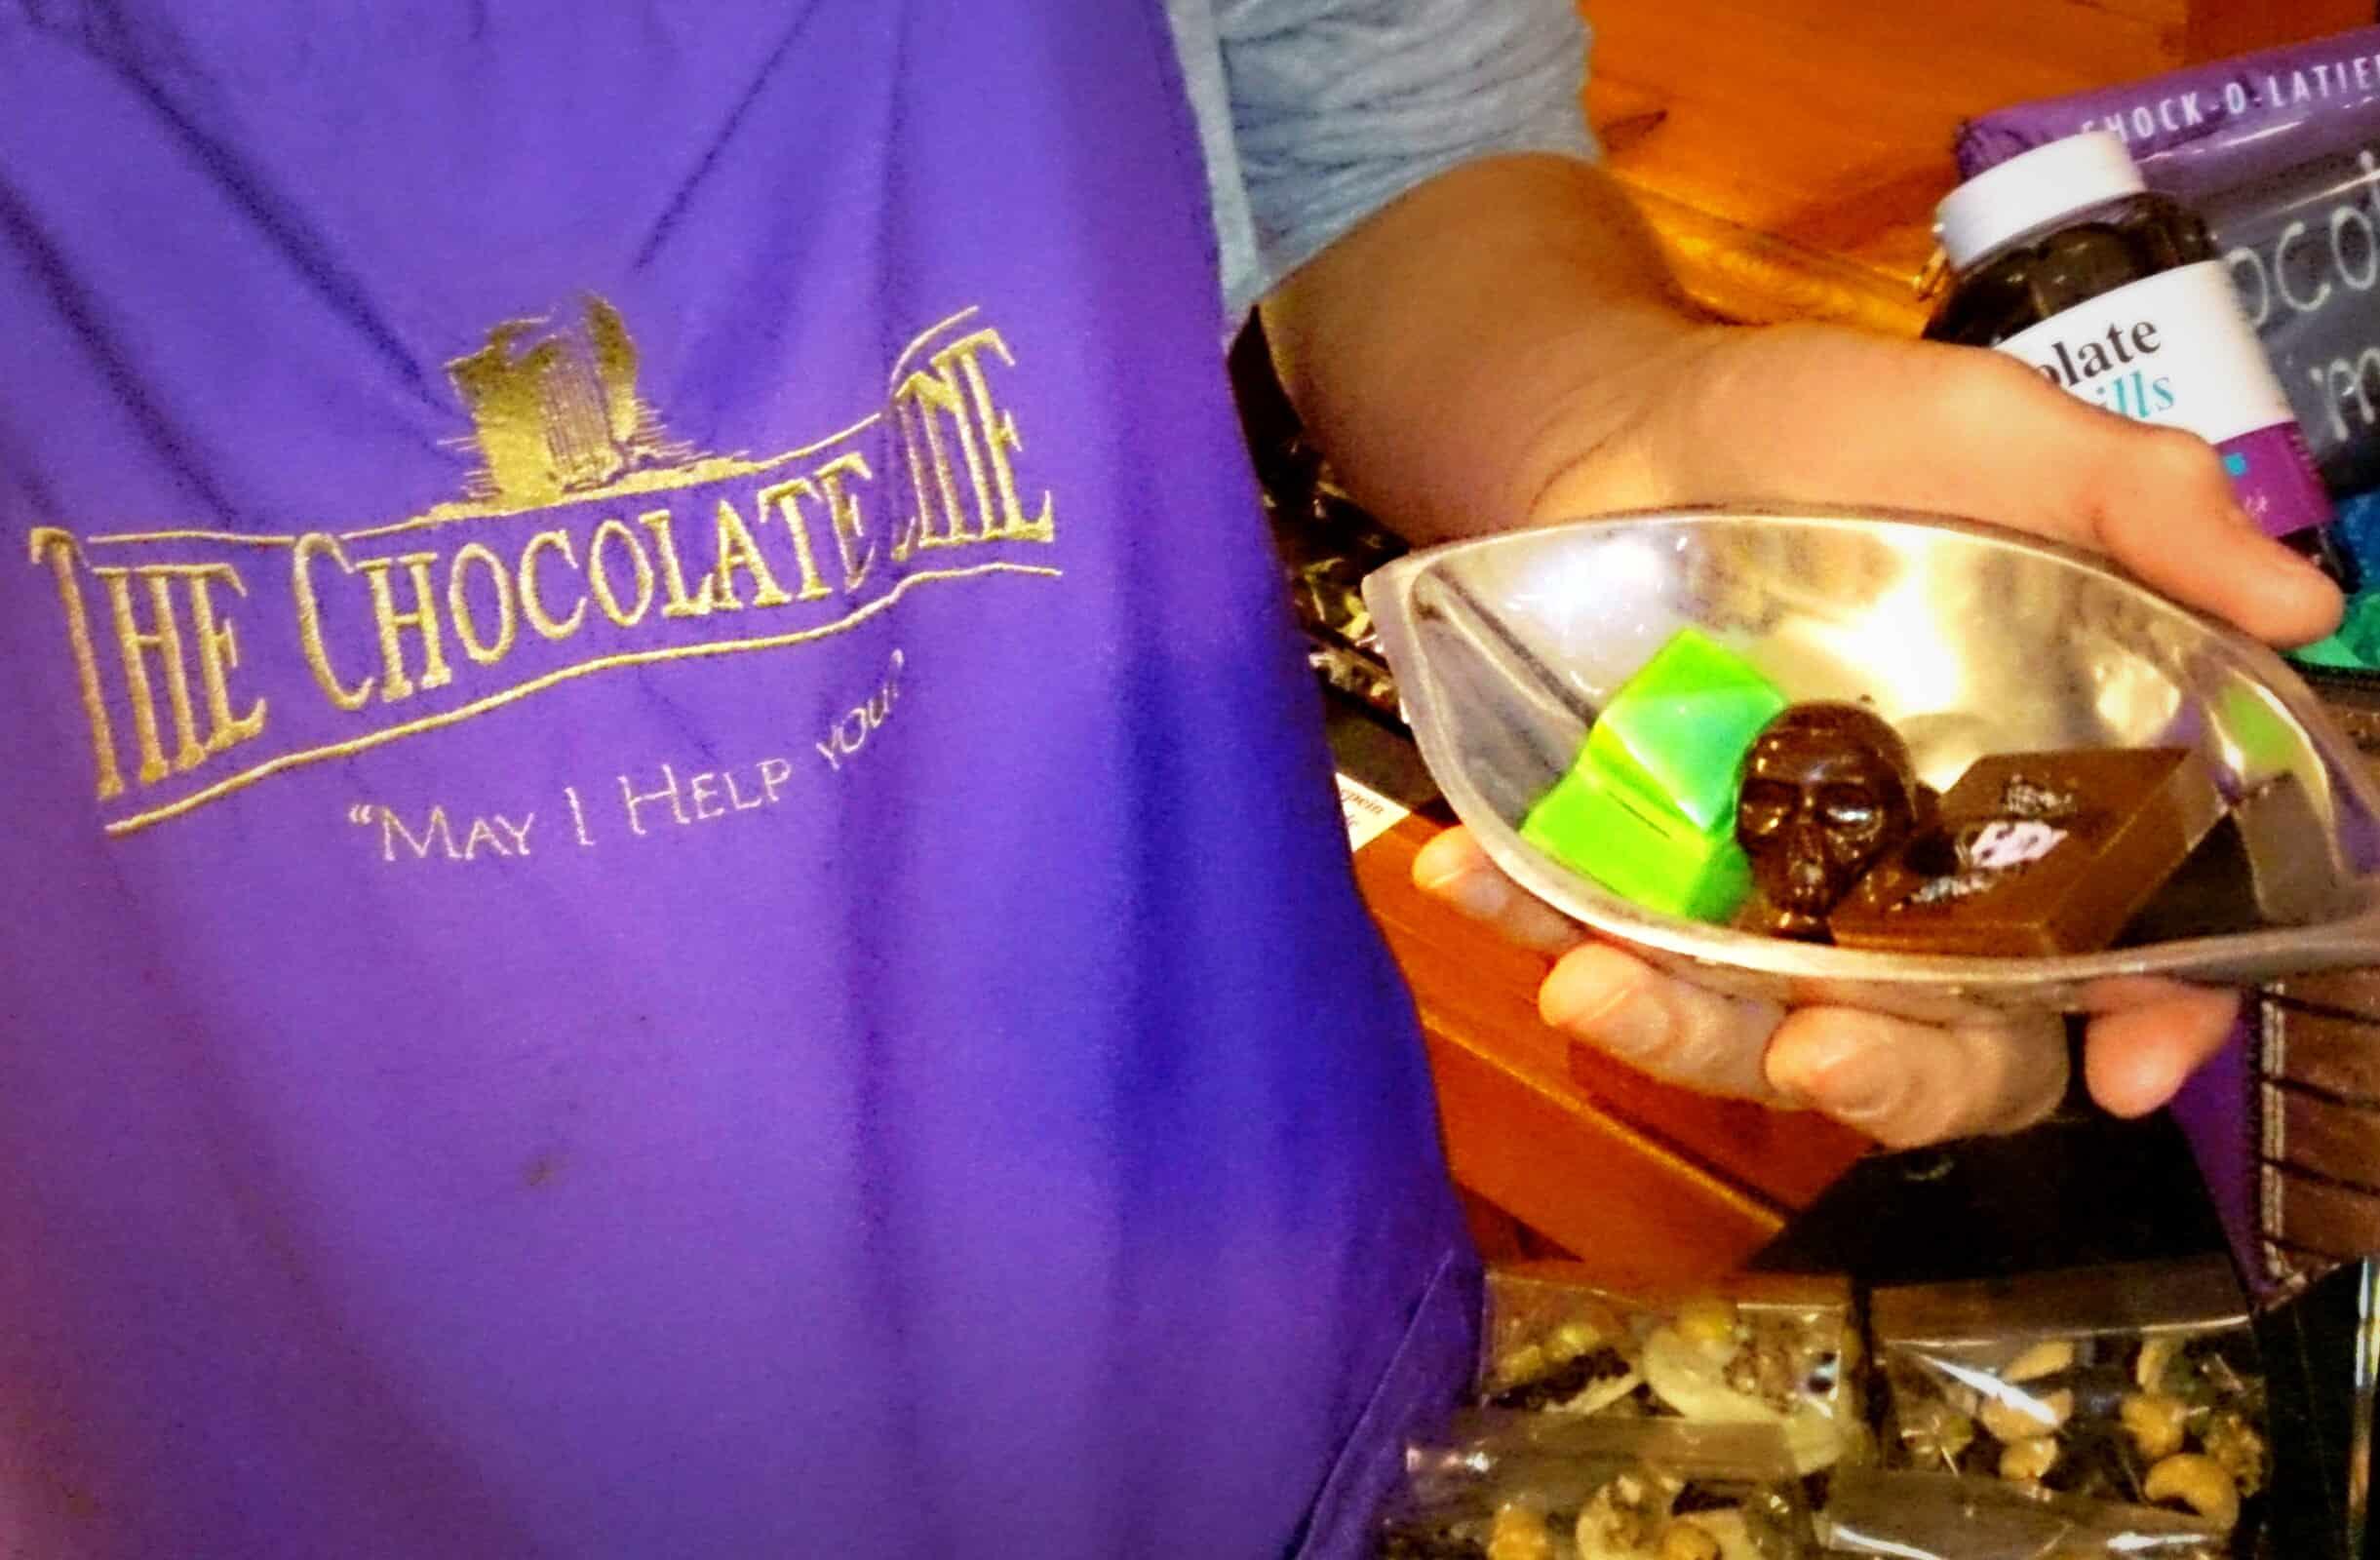 Schokolade chocolate Belgium Belgien